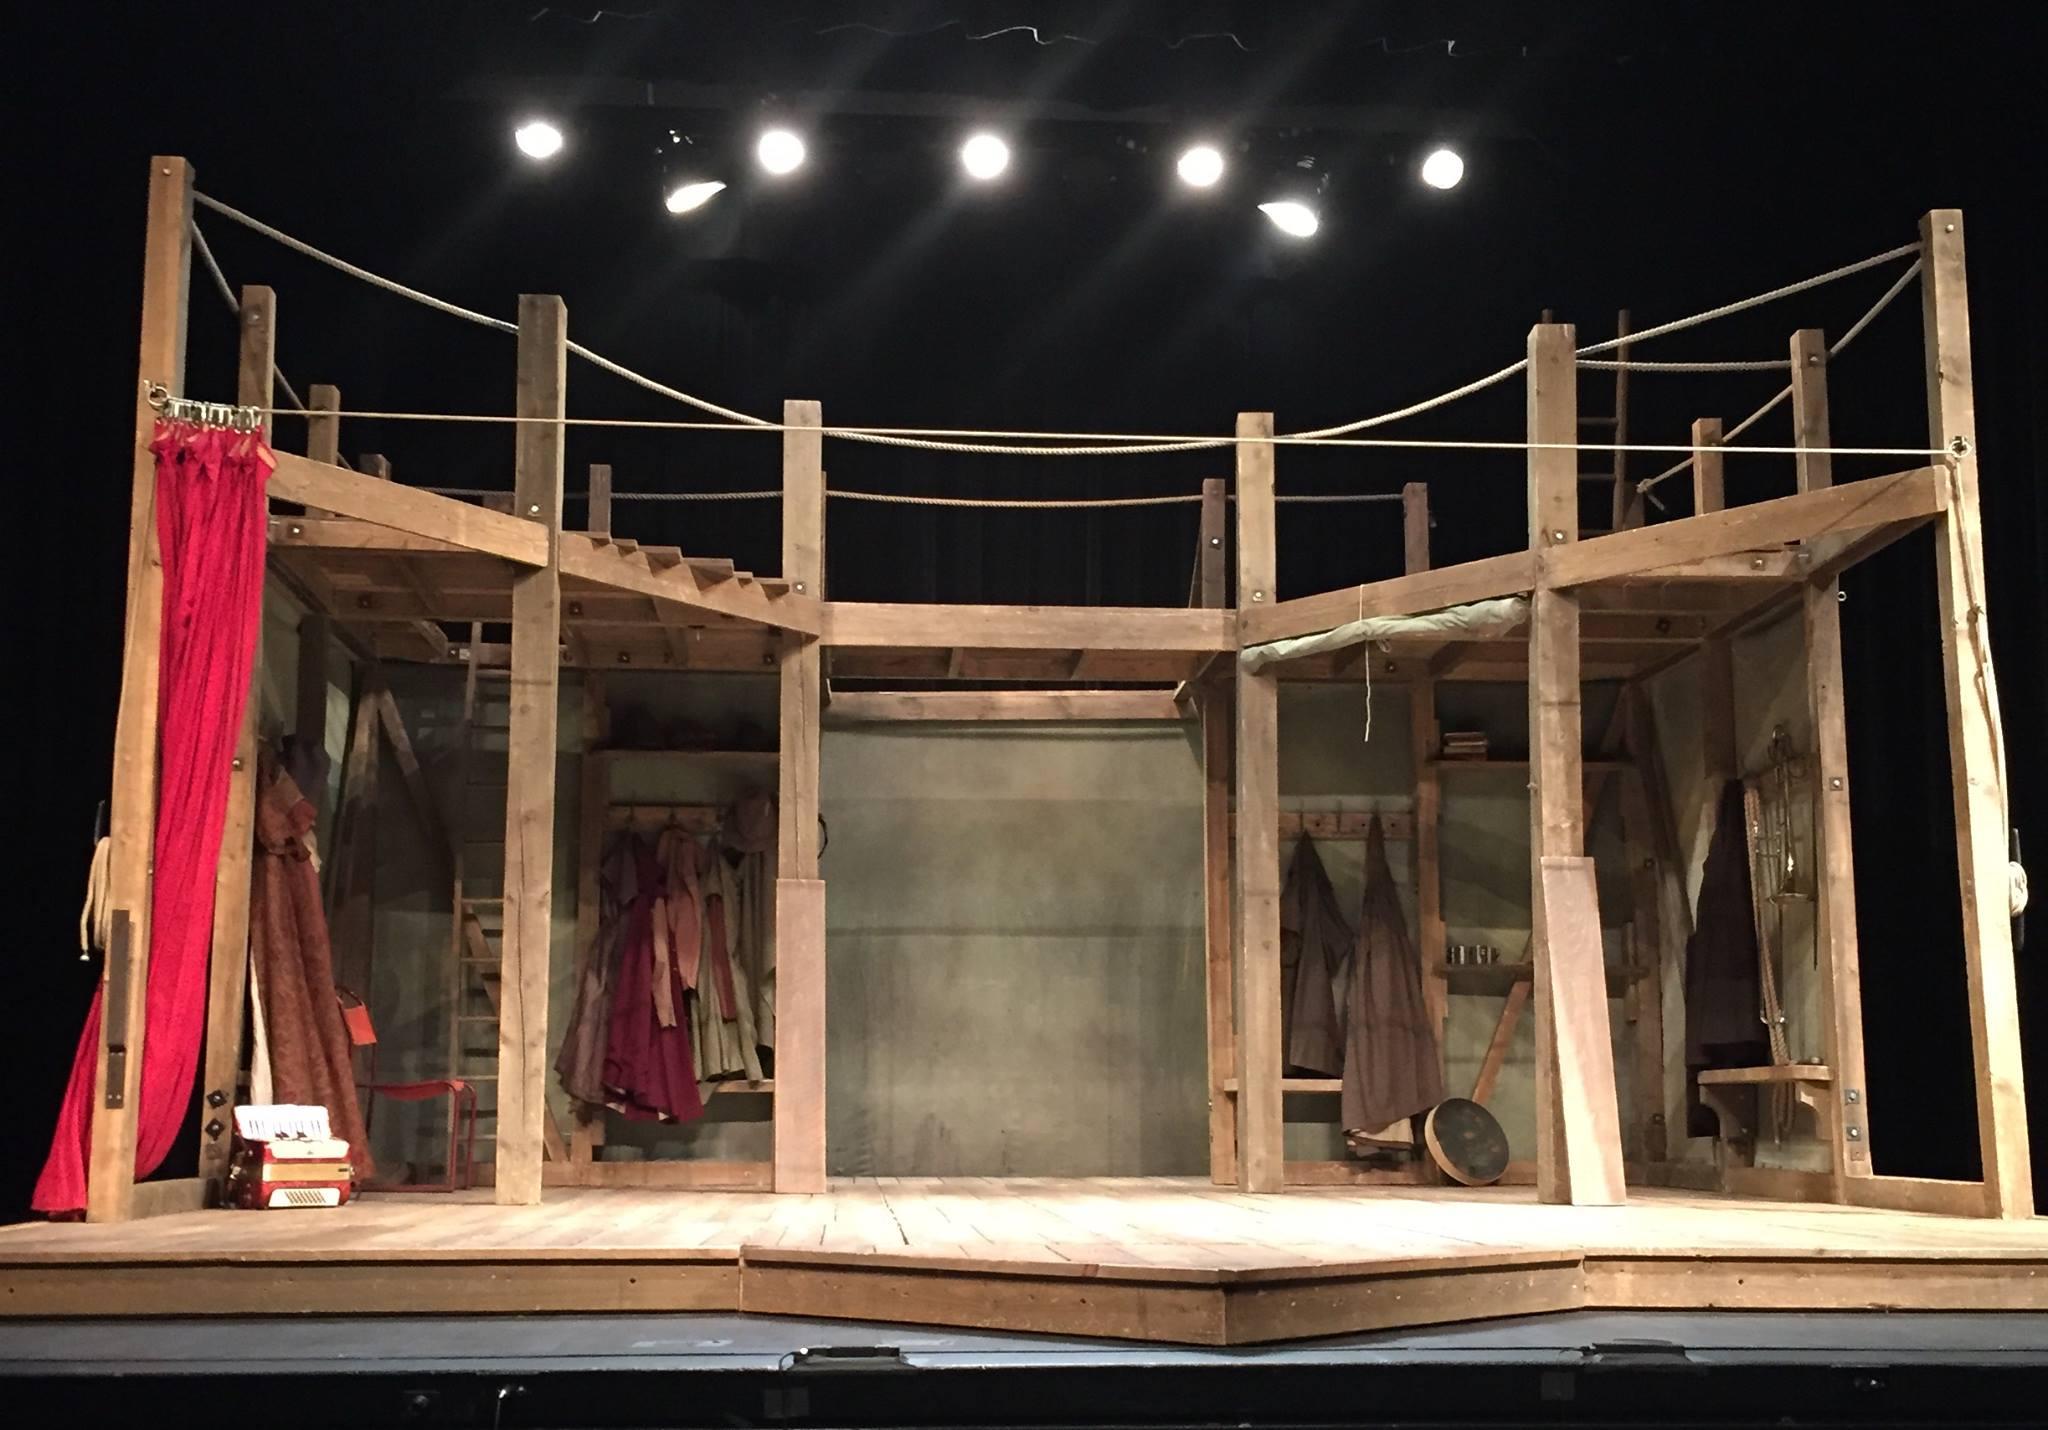 King Lear set (courtesy: Cathy Lewis)